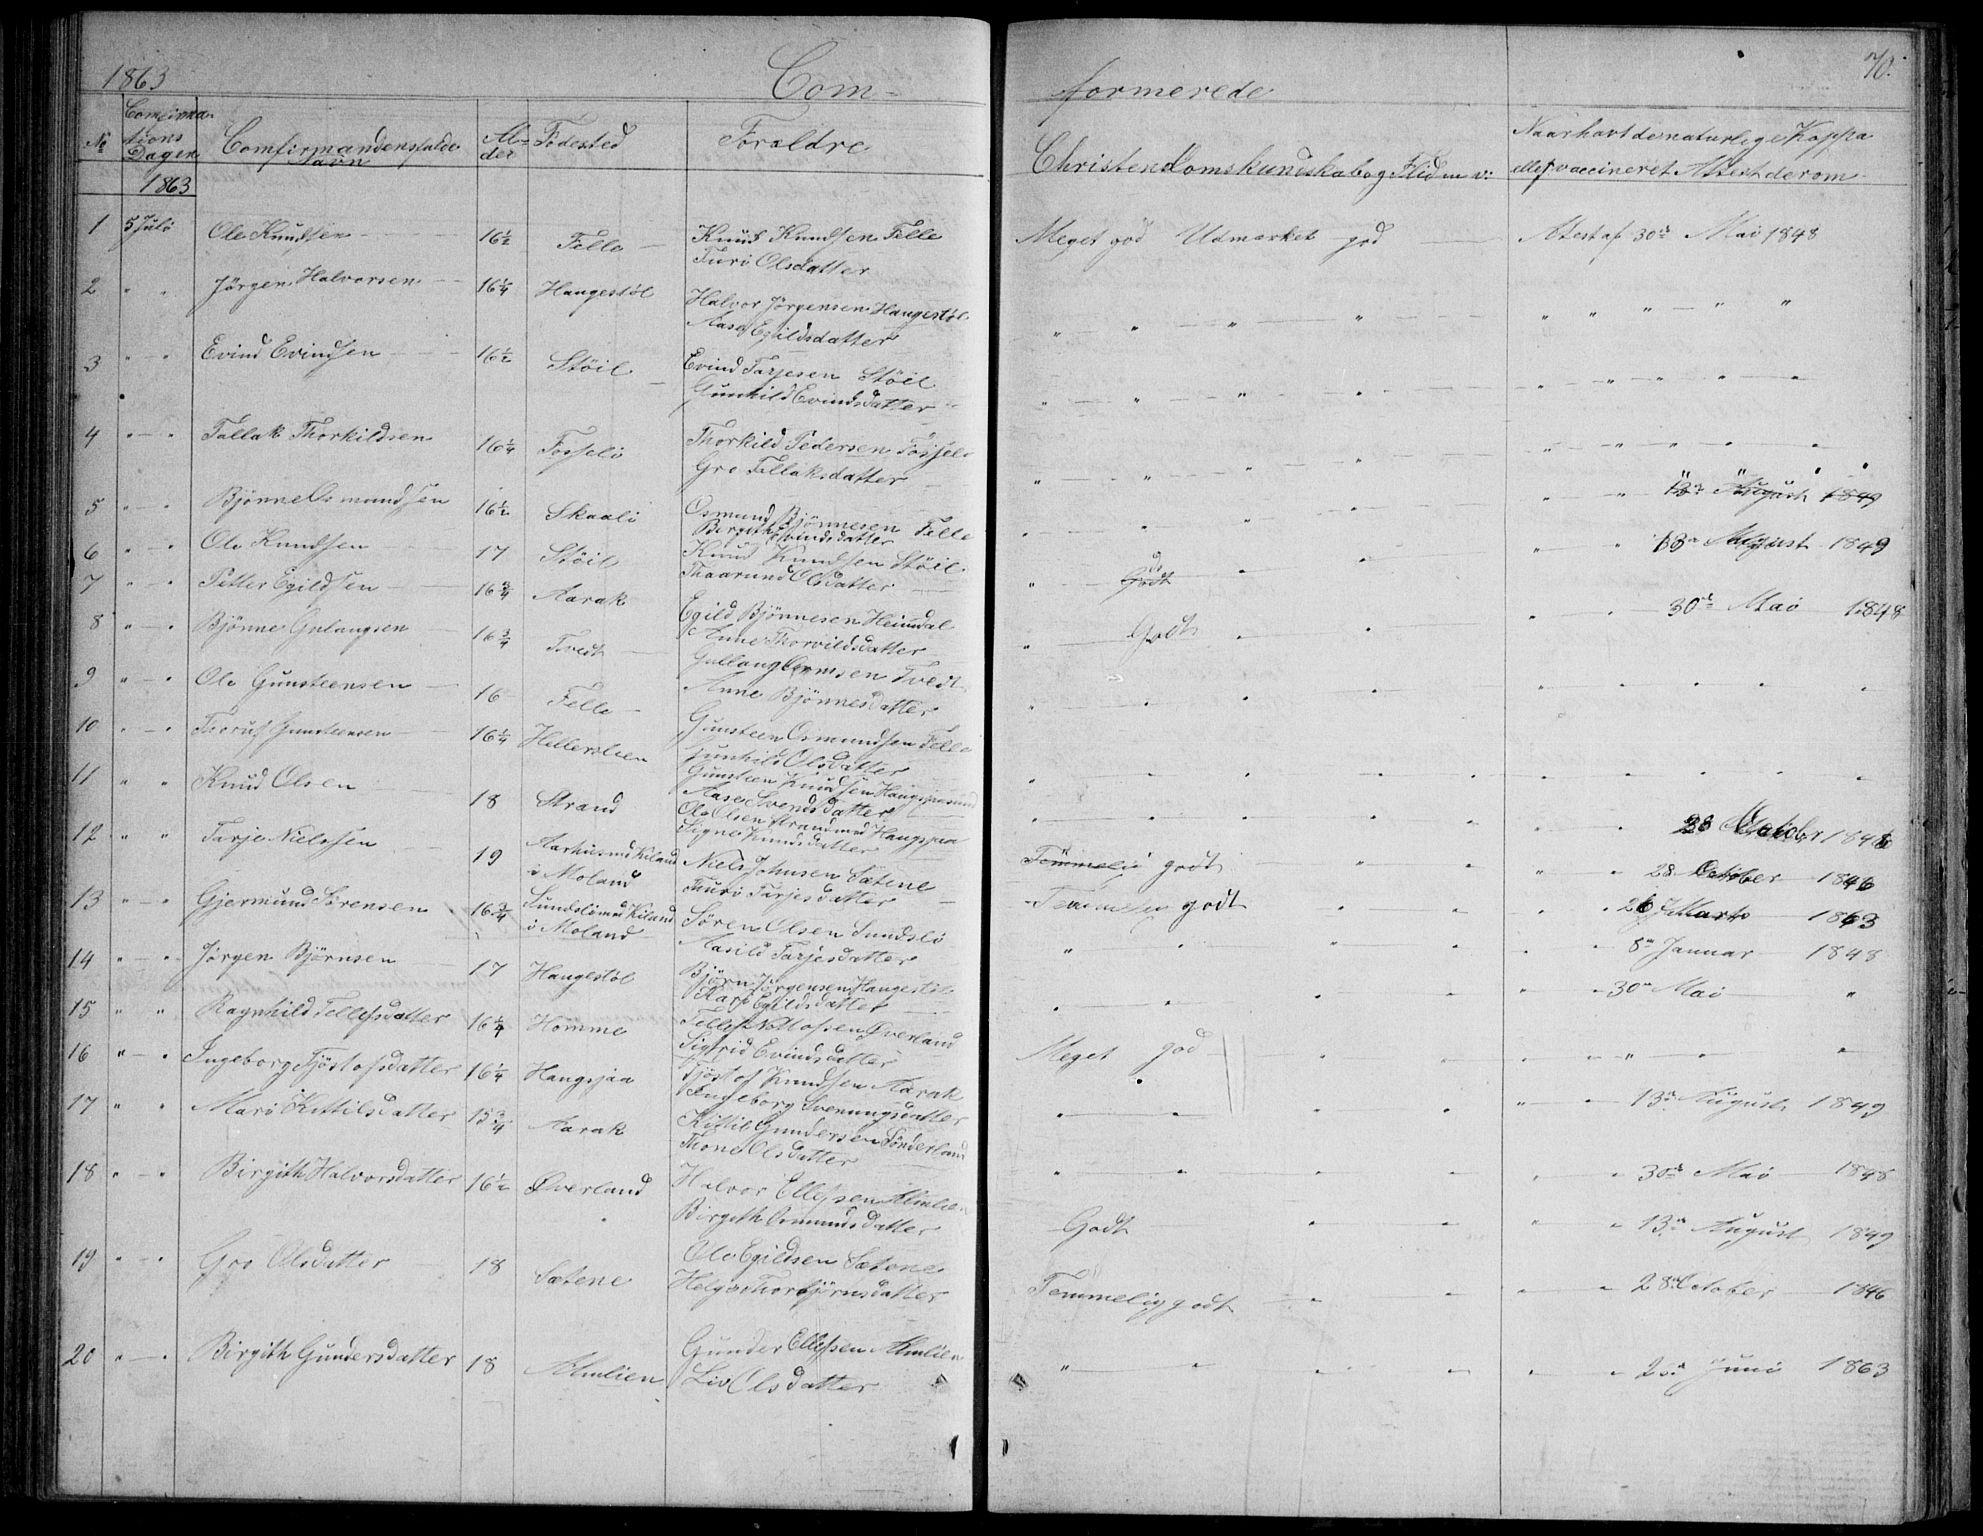 SAKO, Nissedal kirkebøker, G/Gb/L0002: Klokkerbok nr. II 2, 1863-1892, s. 70